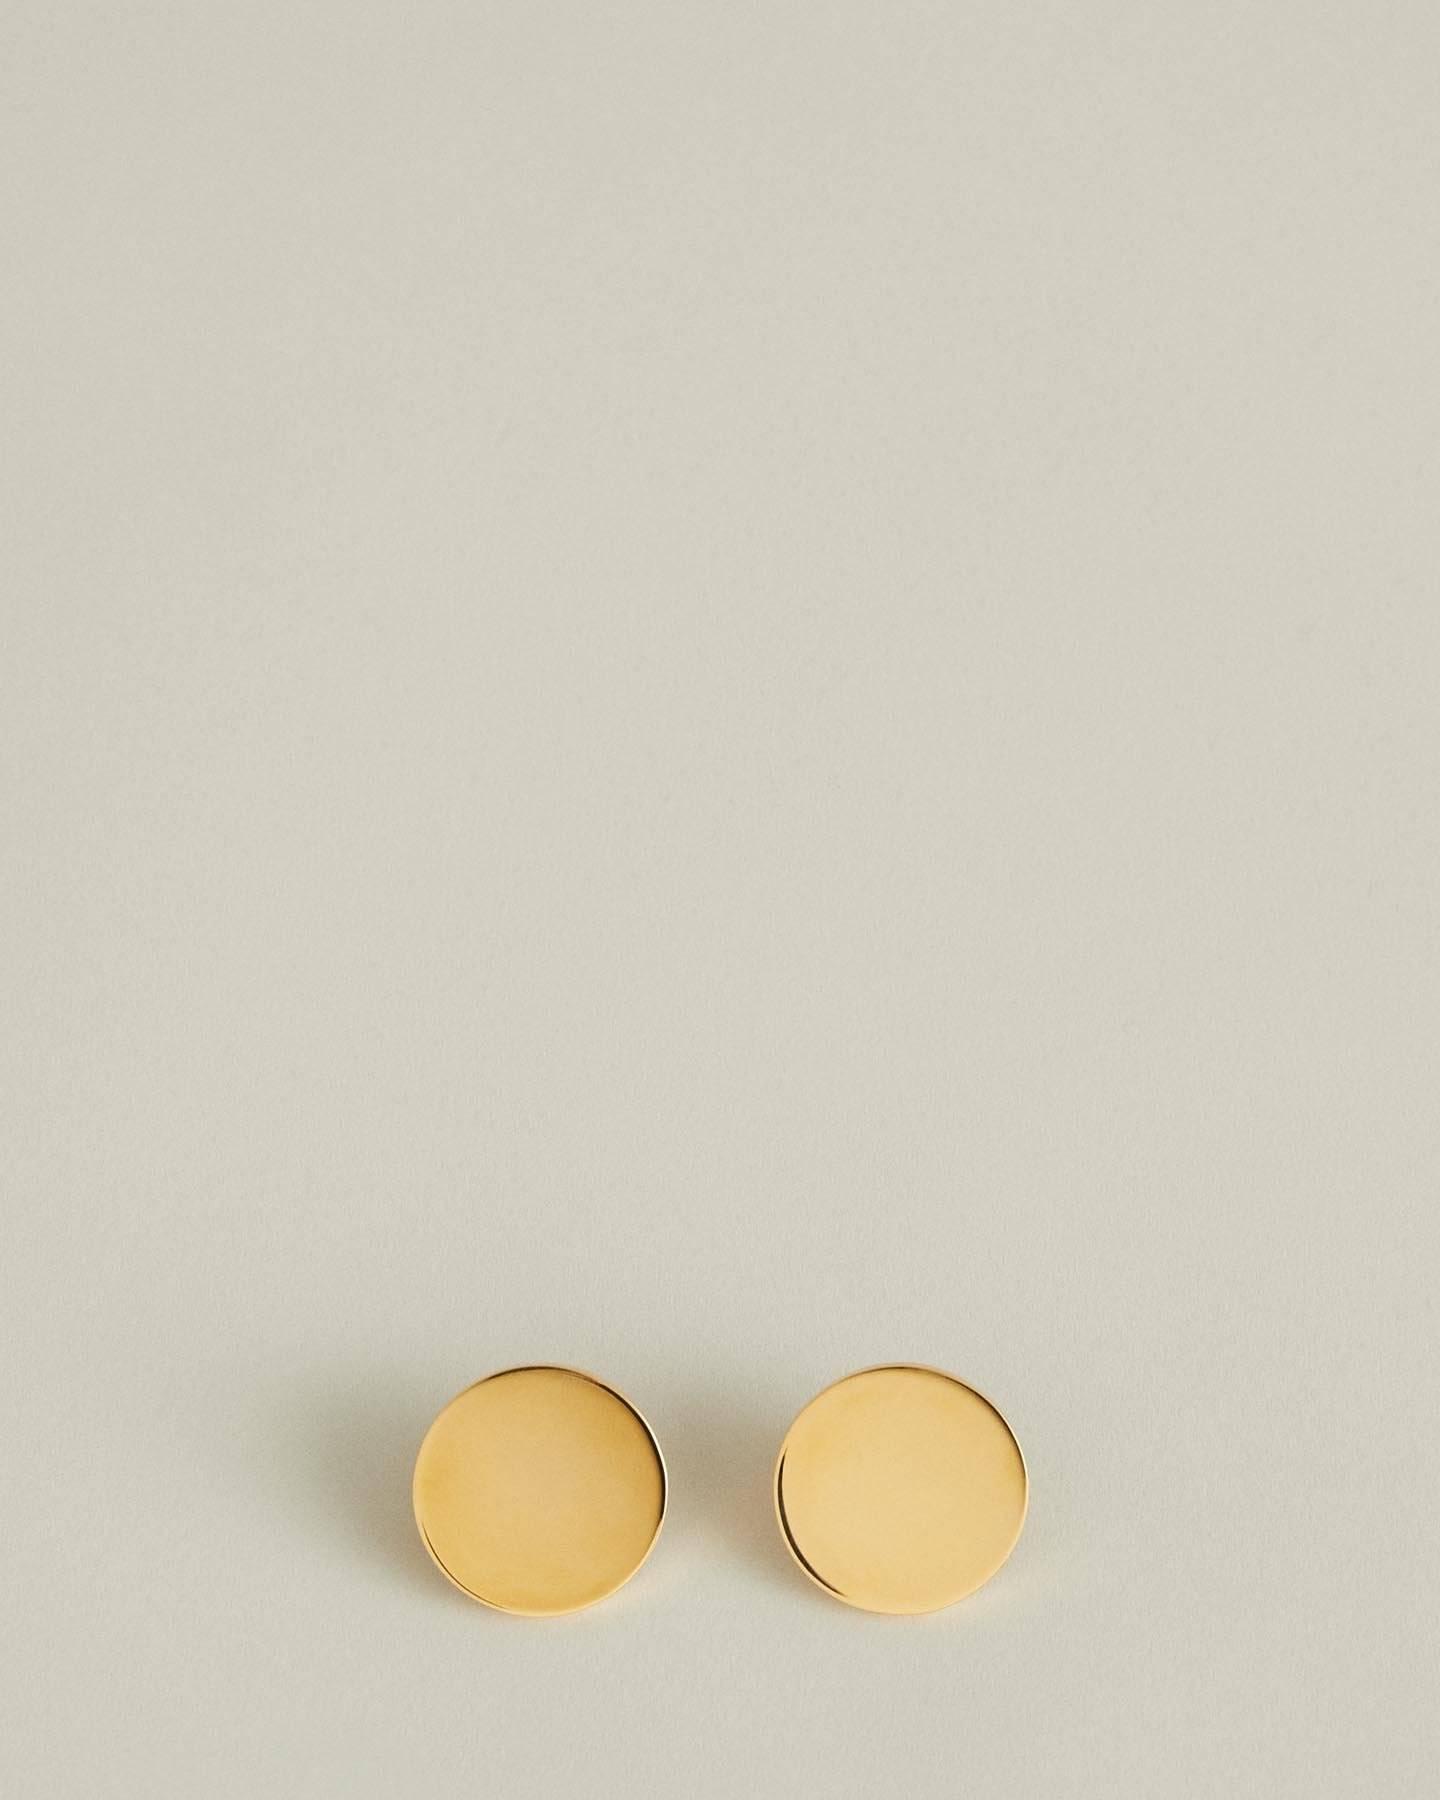 /products/lock-earrings-3